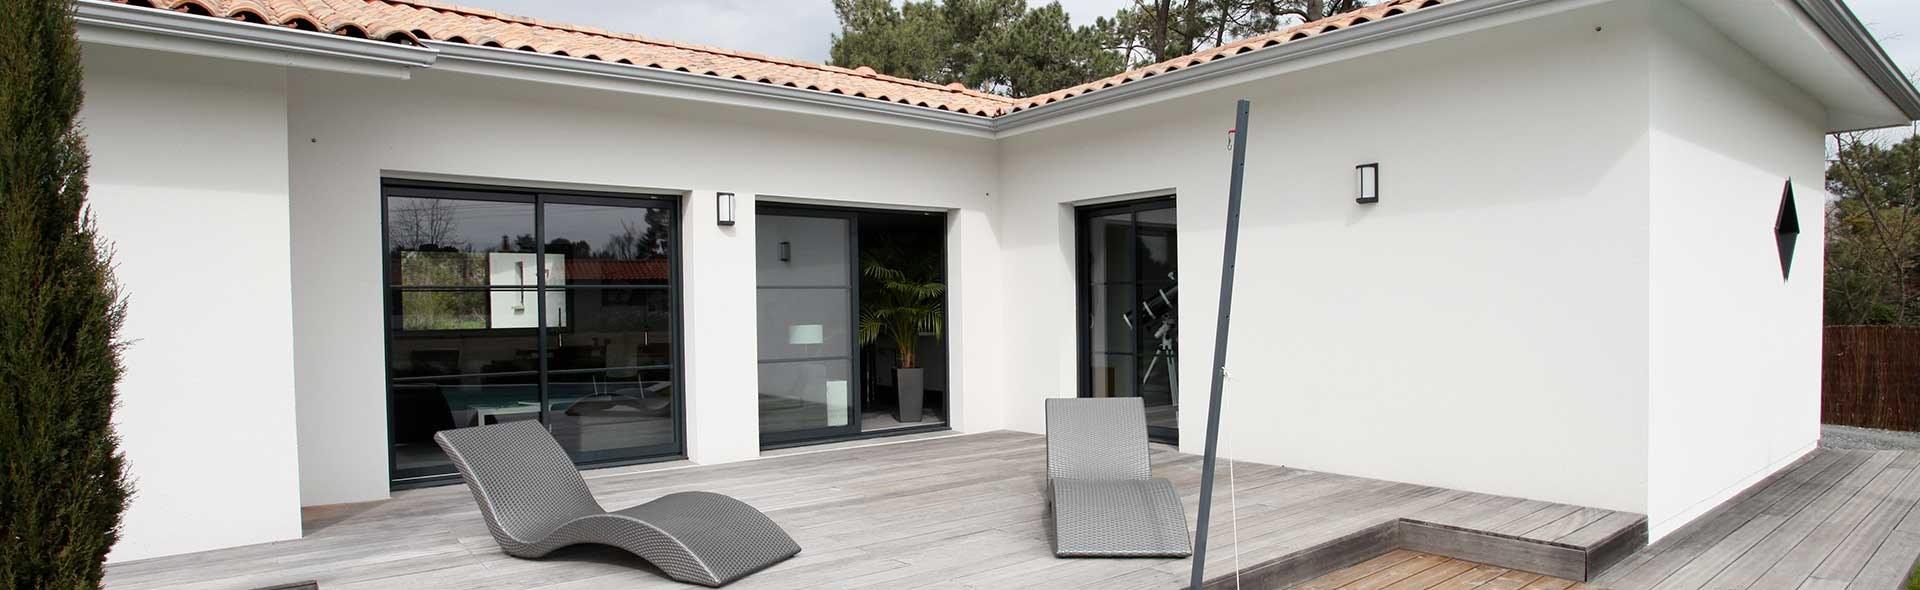 constructeur maison individuelle gironde